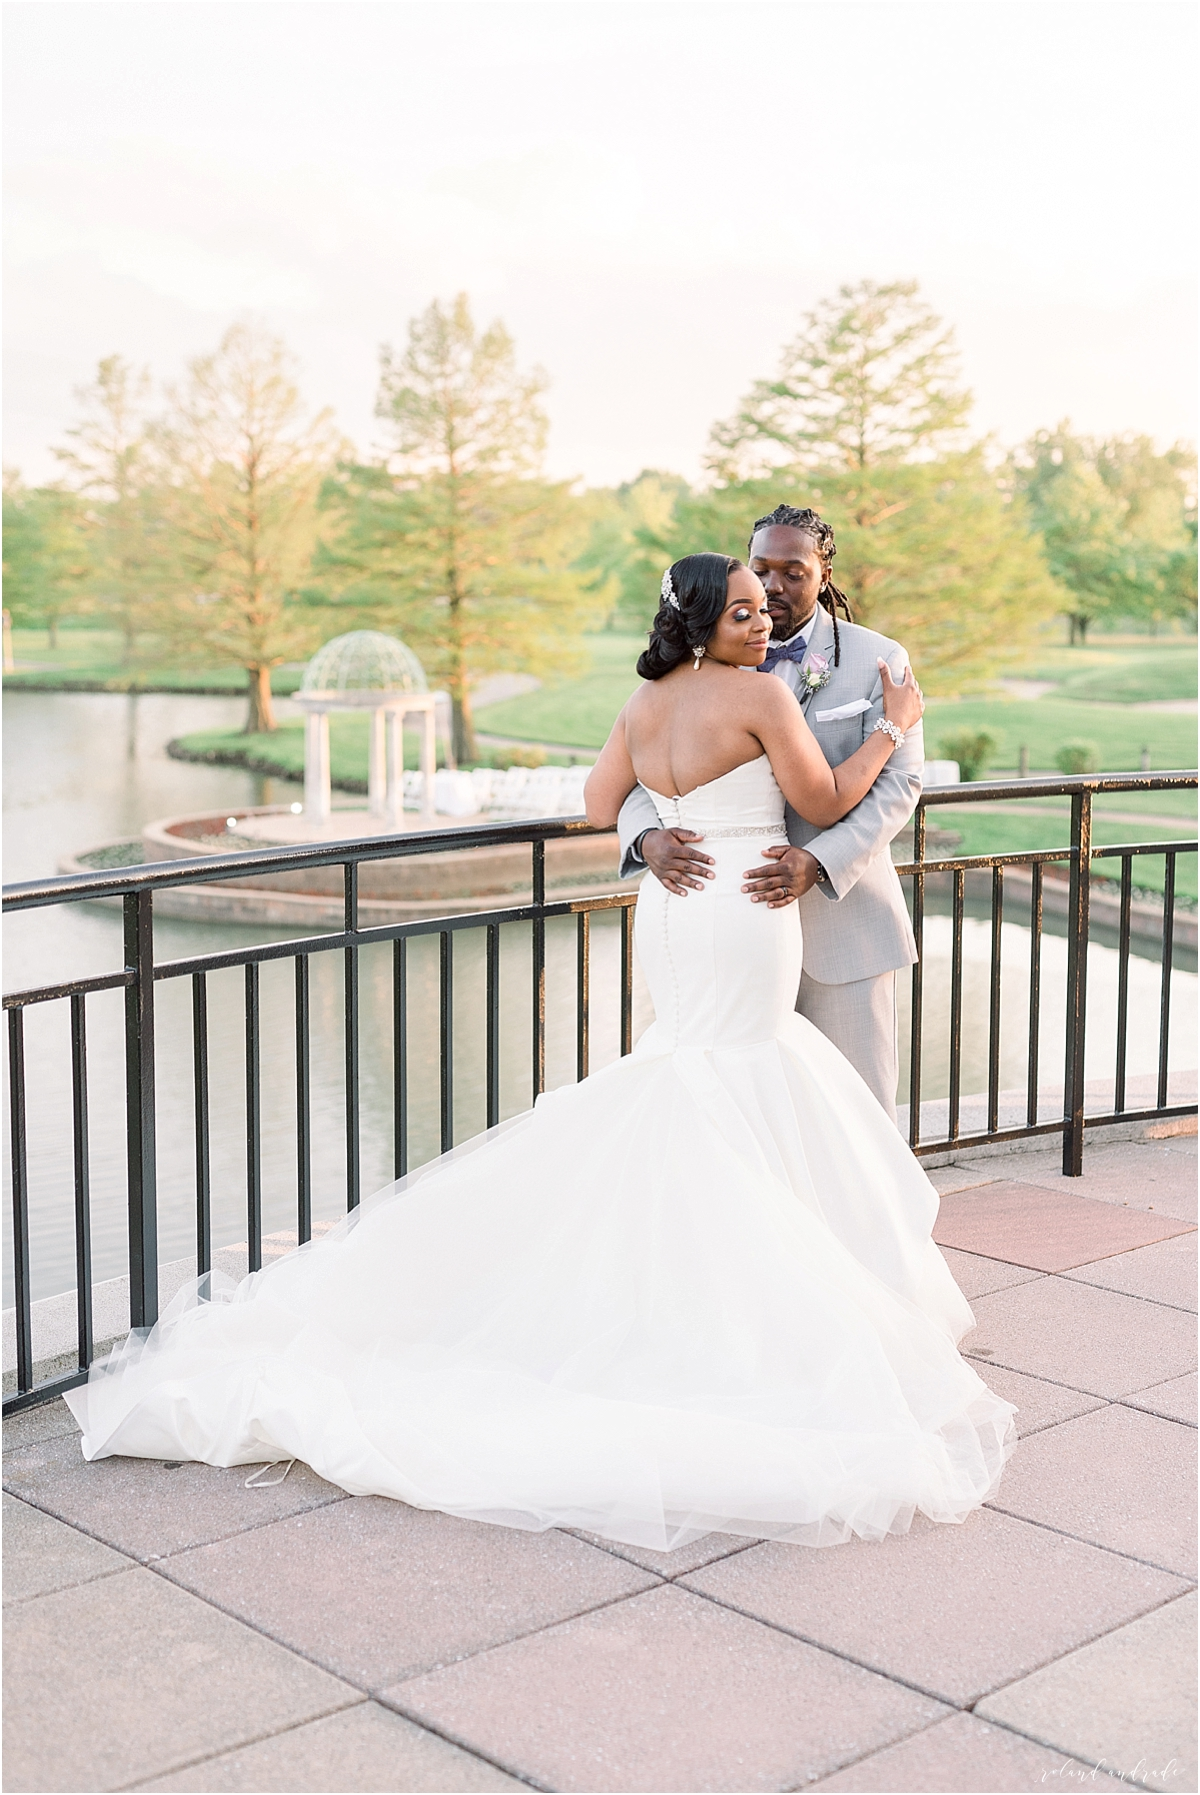 The Odyssey Wedding, Tinley Park Wedding, Chicago Wedding Photographer, Best Photographer In Tineley Park, Best Photographer In Chicago, Light And Airy Photographer_0069.jpg